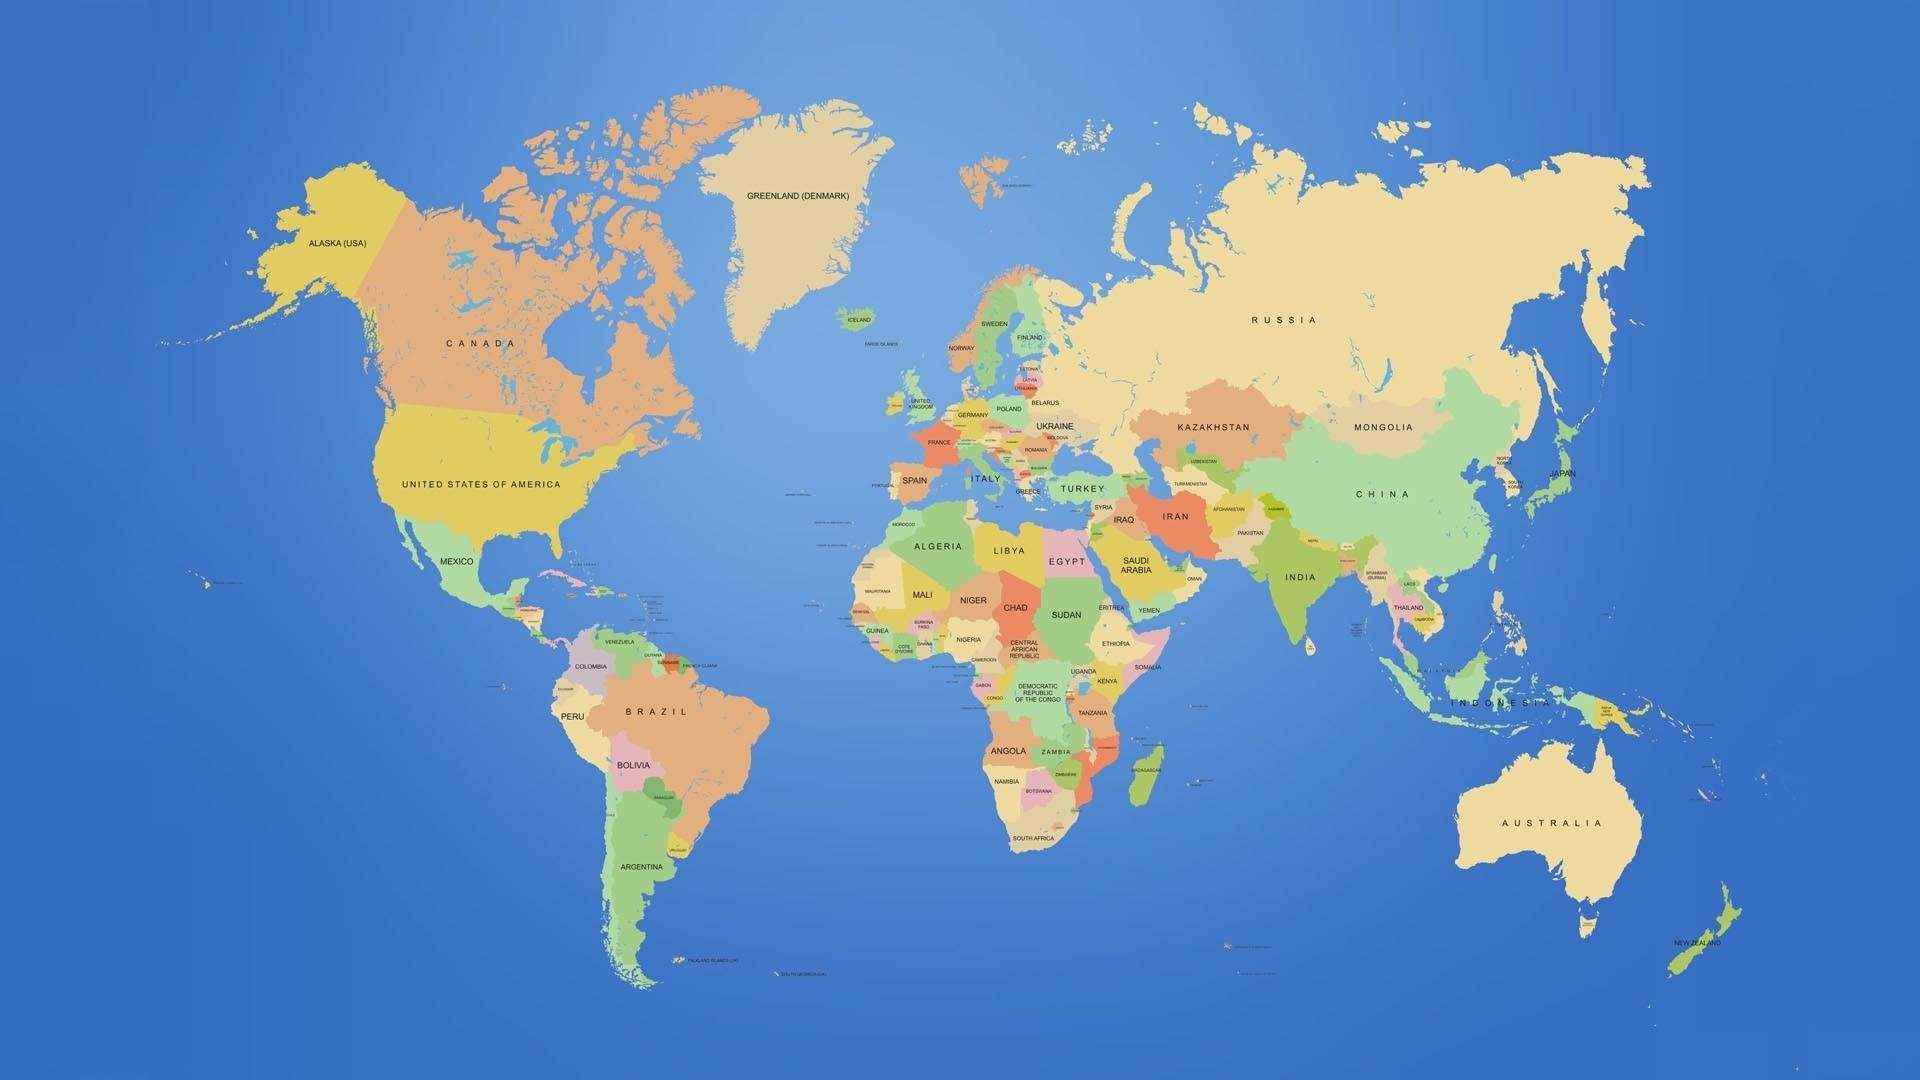 world map wallpaper high resolution at - scrapsofme